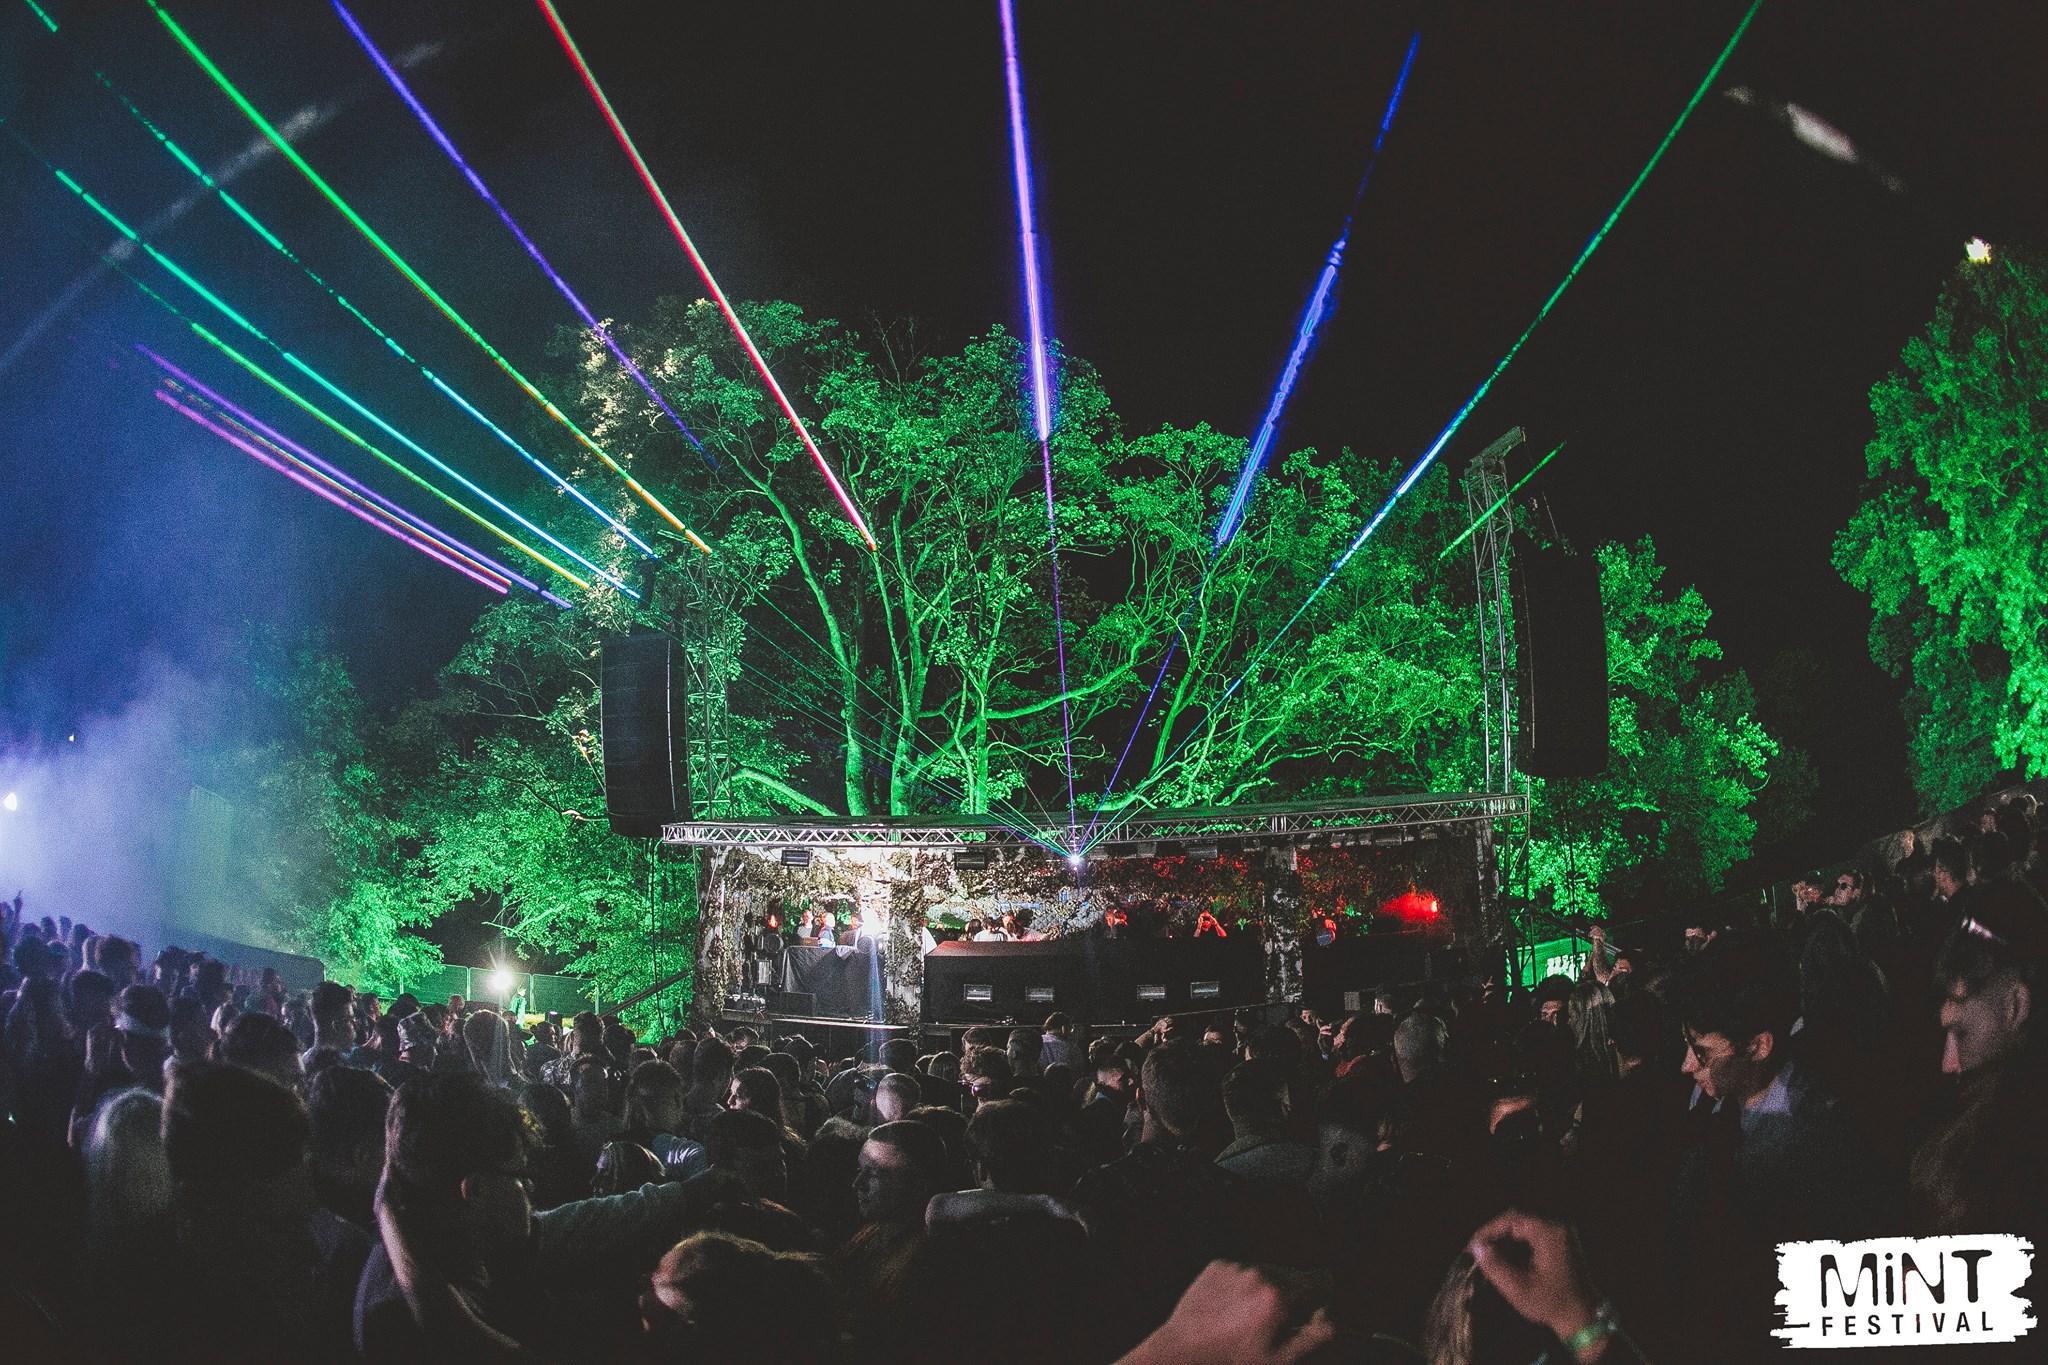 mint festival 2018 on sat 22nd sep 2018 at tba leeds fatsoma